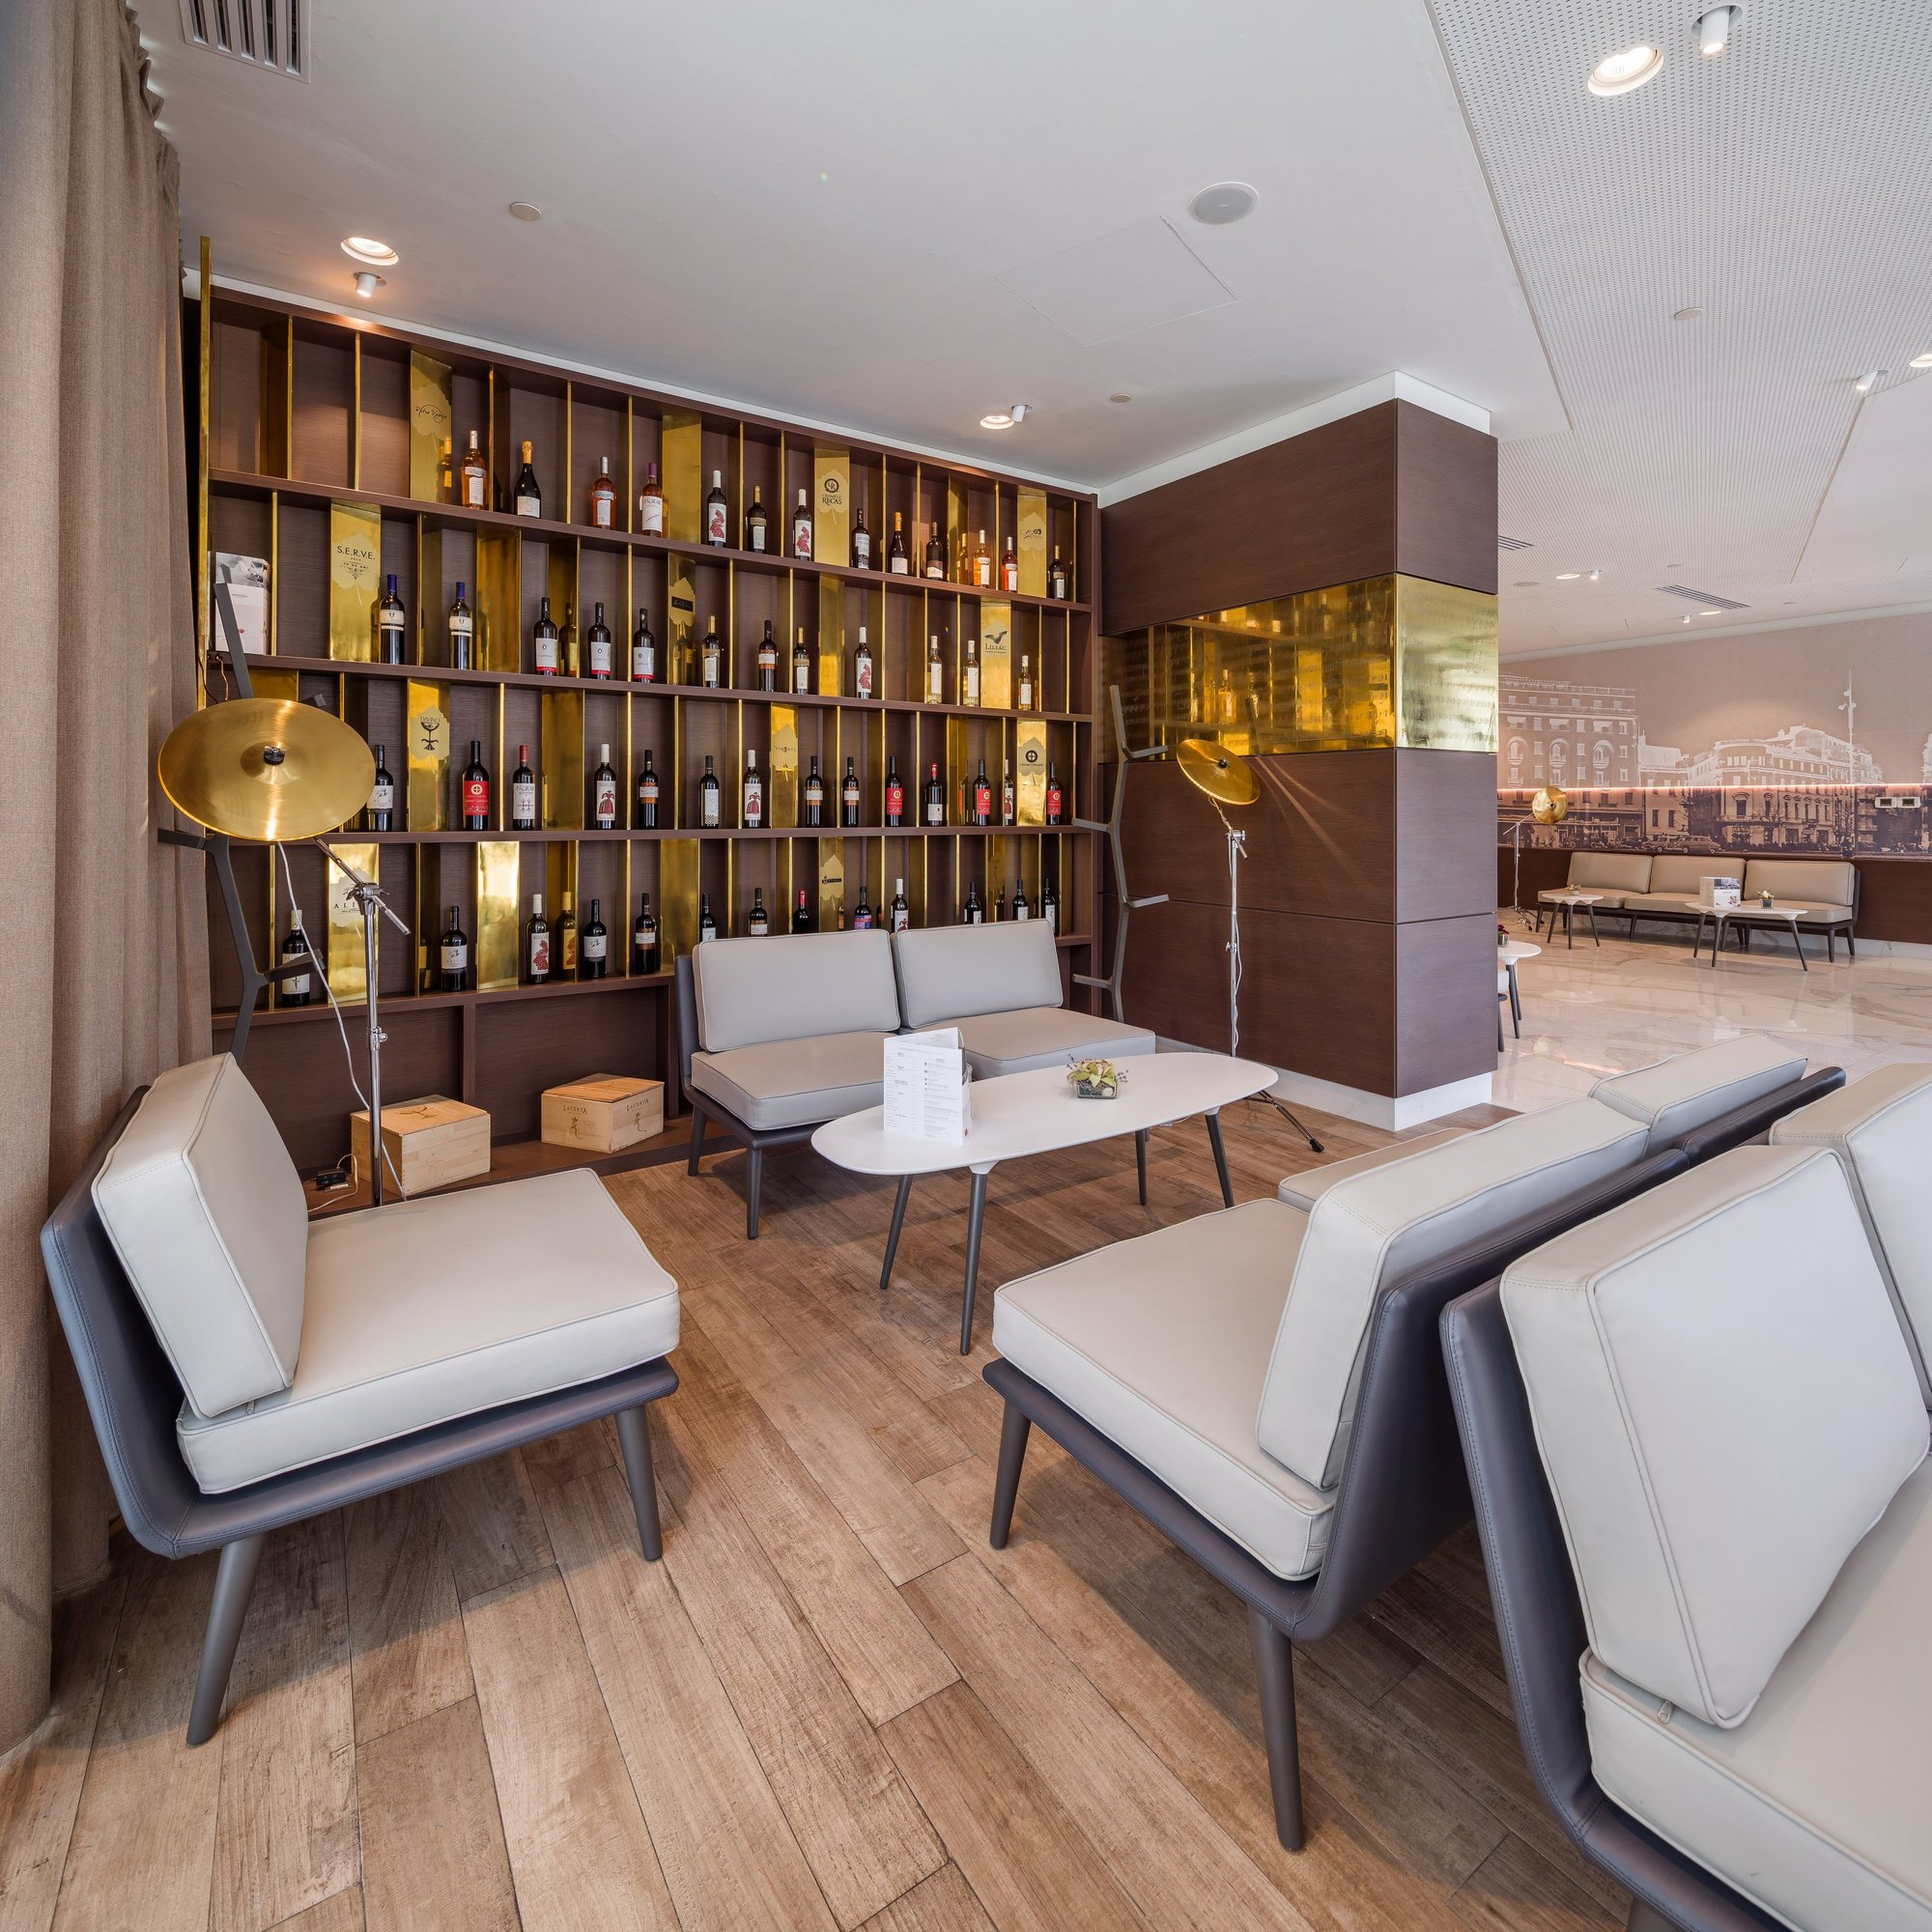 Galer a de hotel mercure en bucarest arhi group 21 for Design hotel east